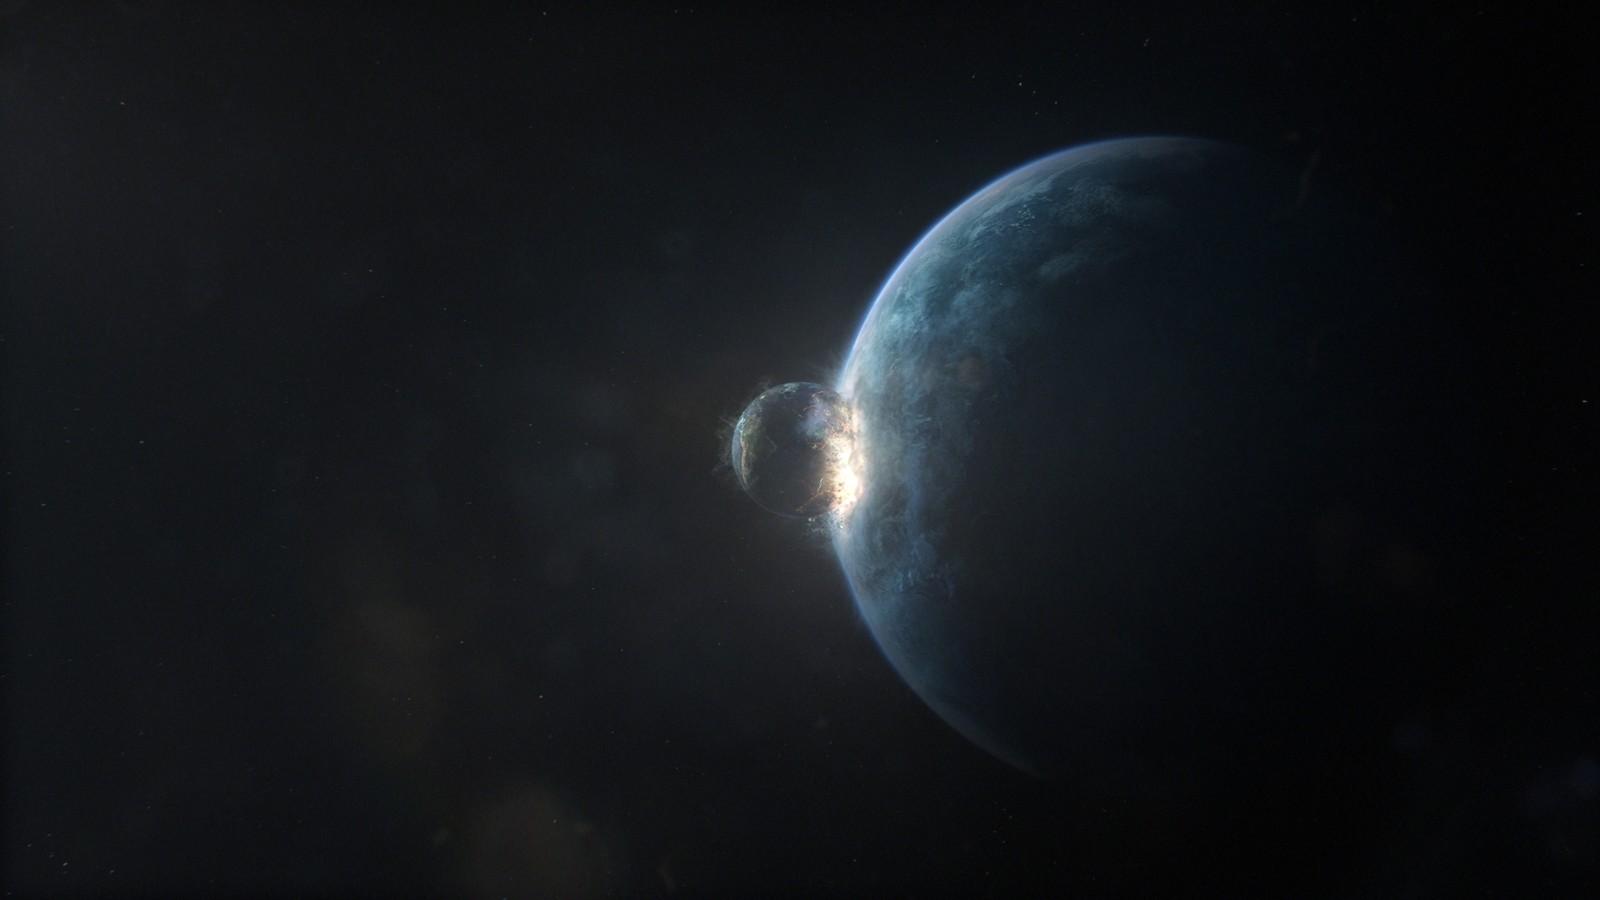 Final shot. Earth gets swallowed by melancholia